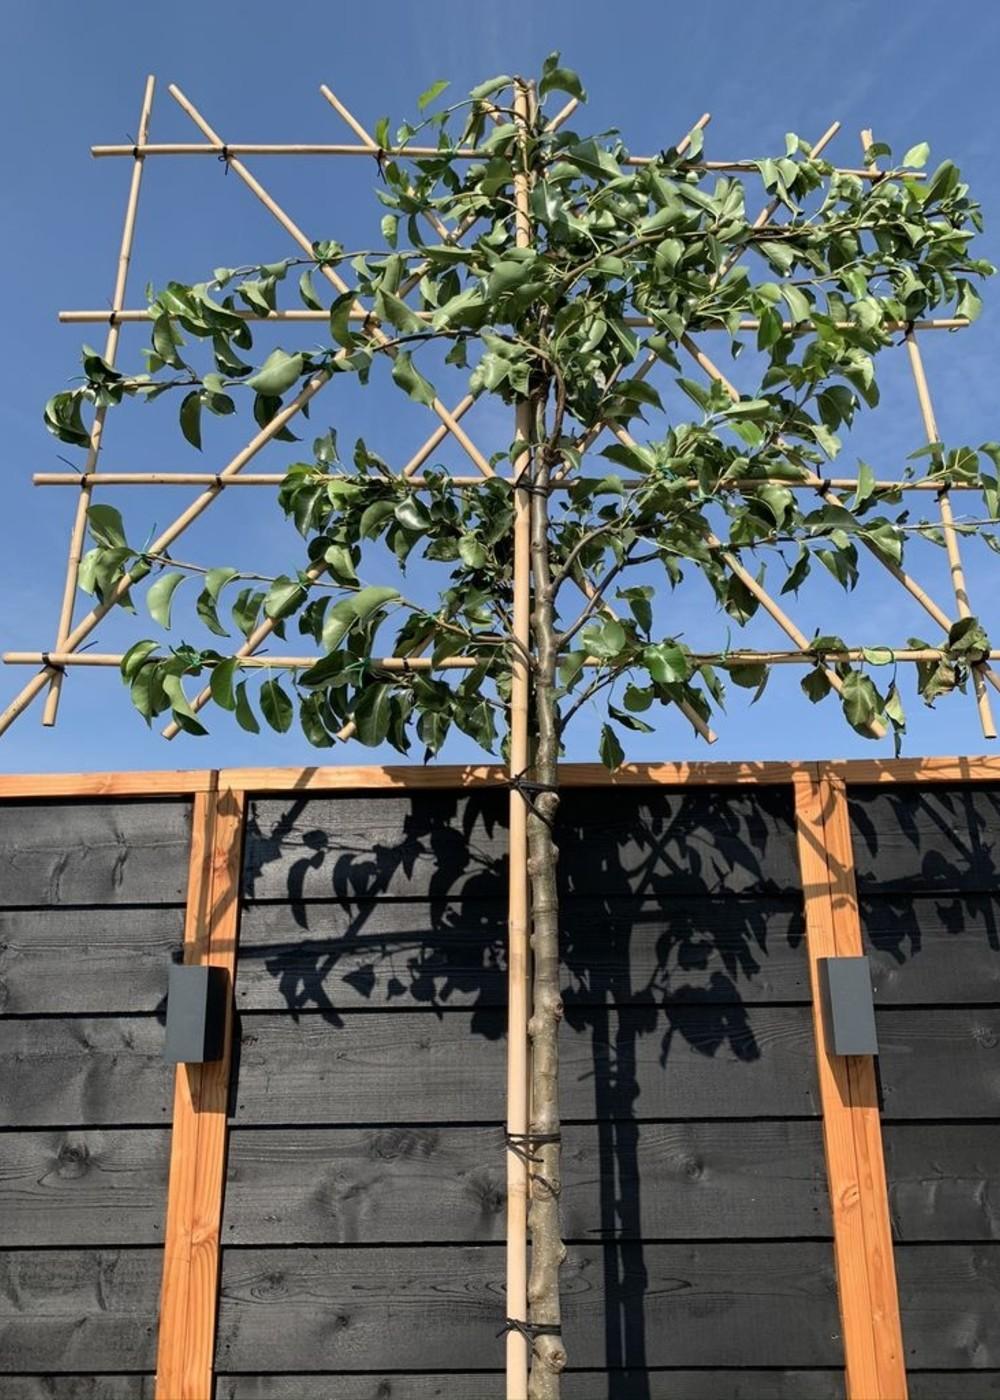 Stadtbirne Chanticleer Spalierbaum   Pyrus calleryana 'Chanticleer' Spalierbaum